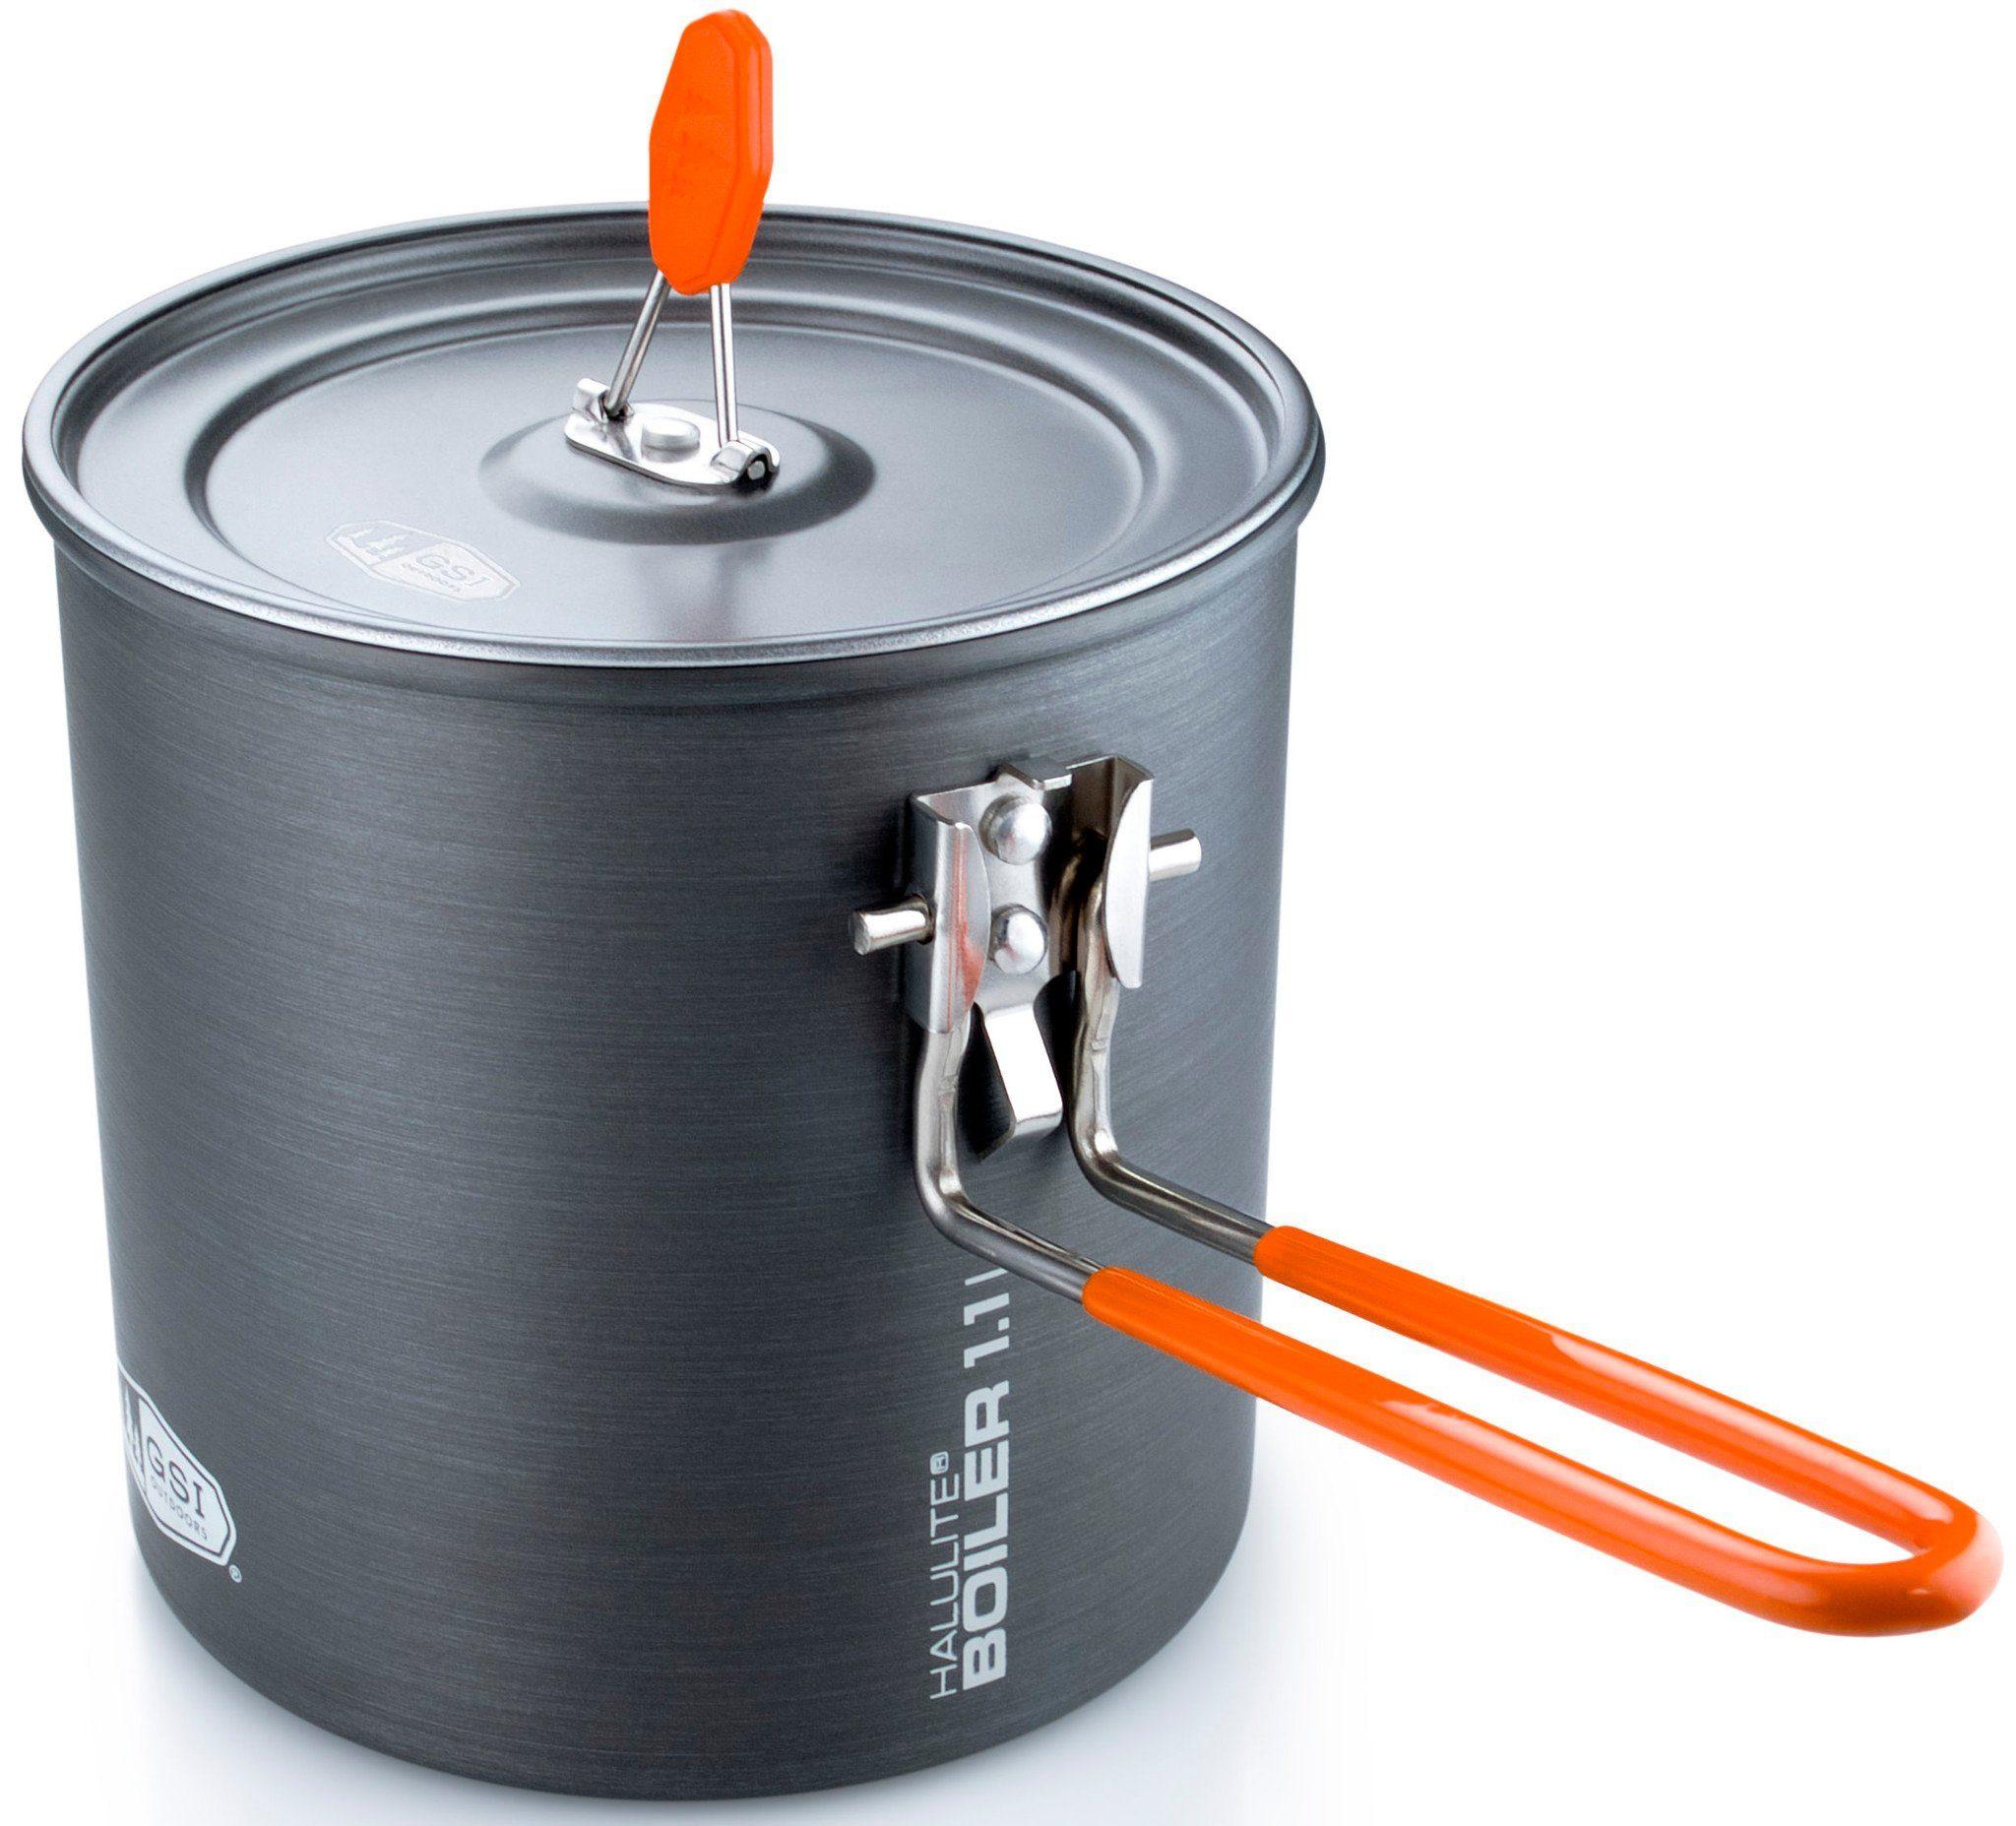 GSI Camping-Geschirr »Halulite Boiler 1,1l«